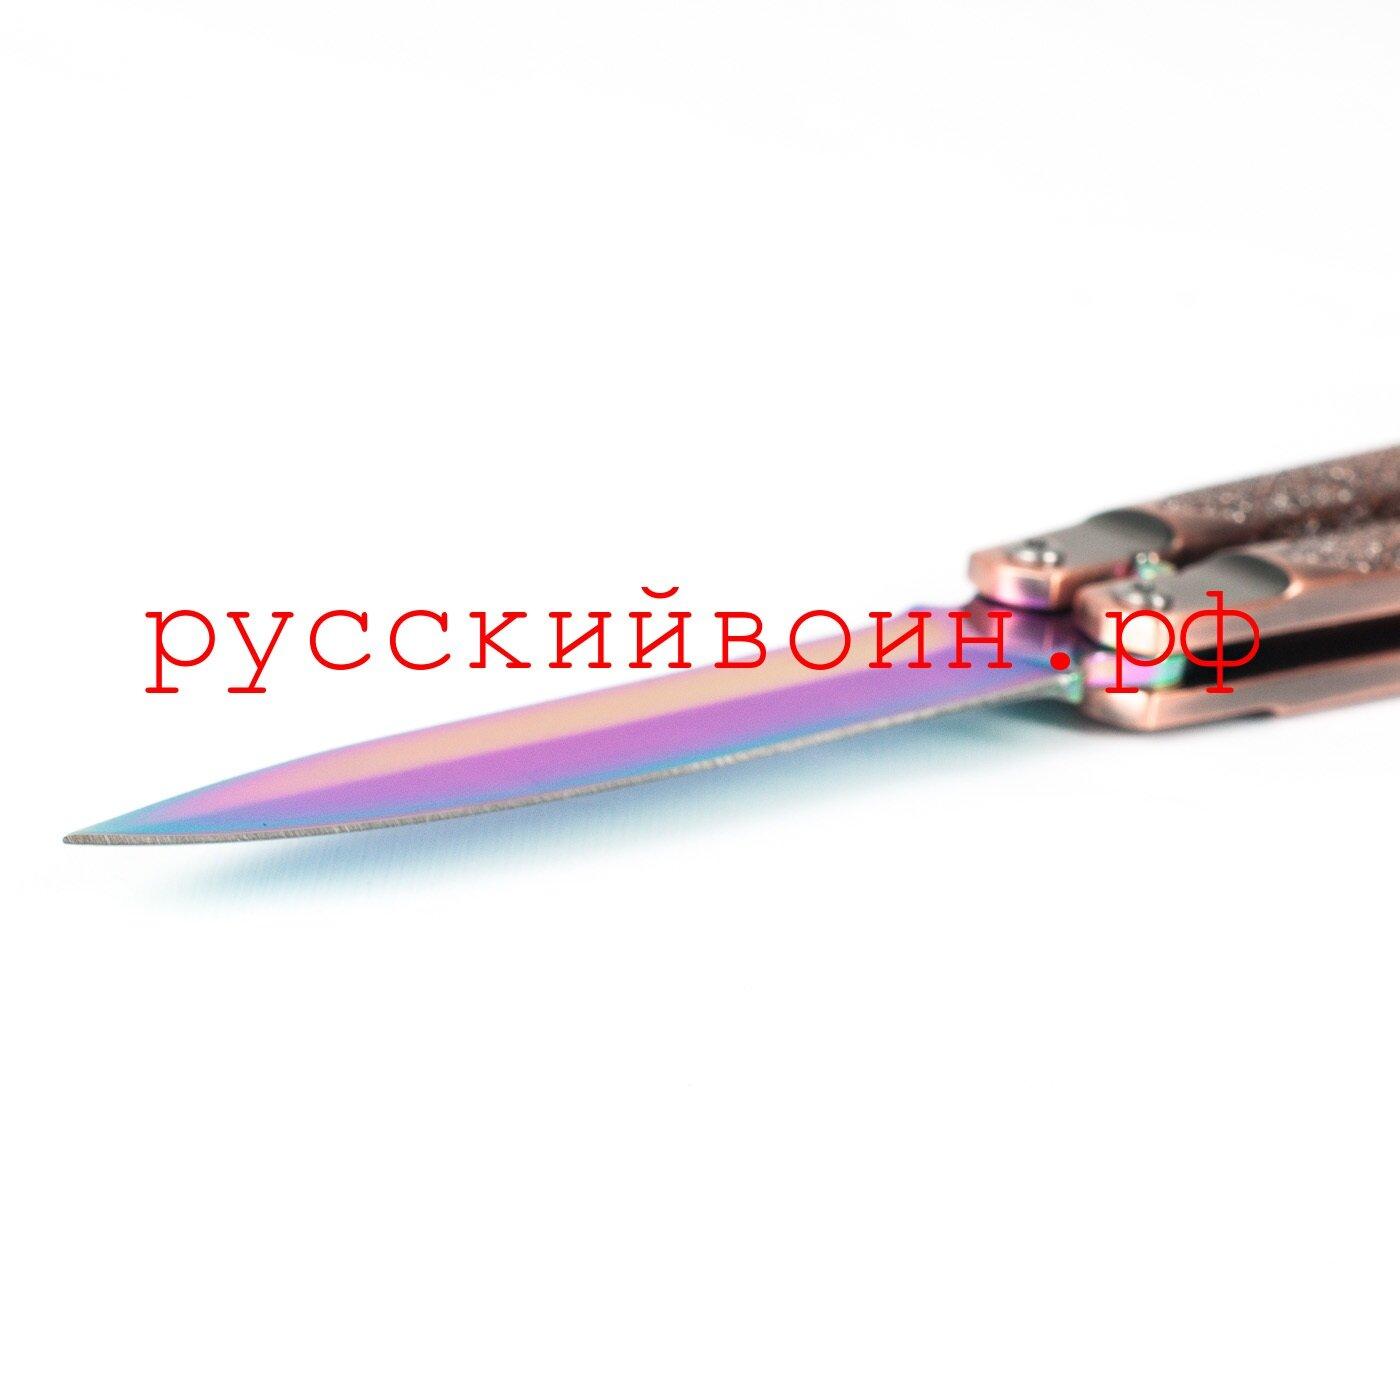 Нож-бабочка East Градиент